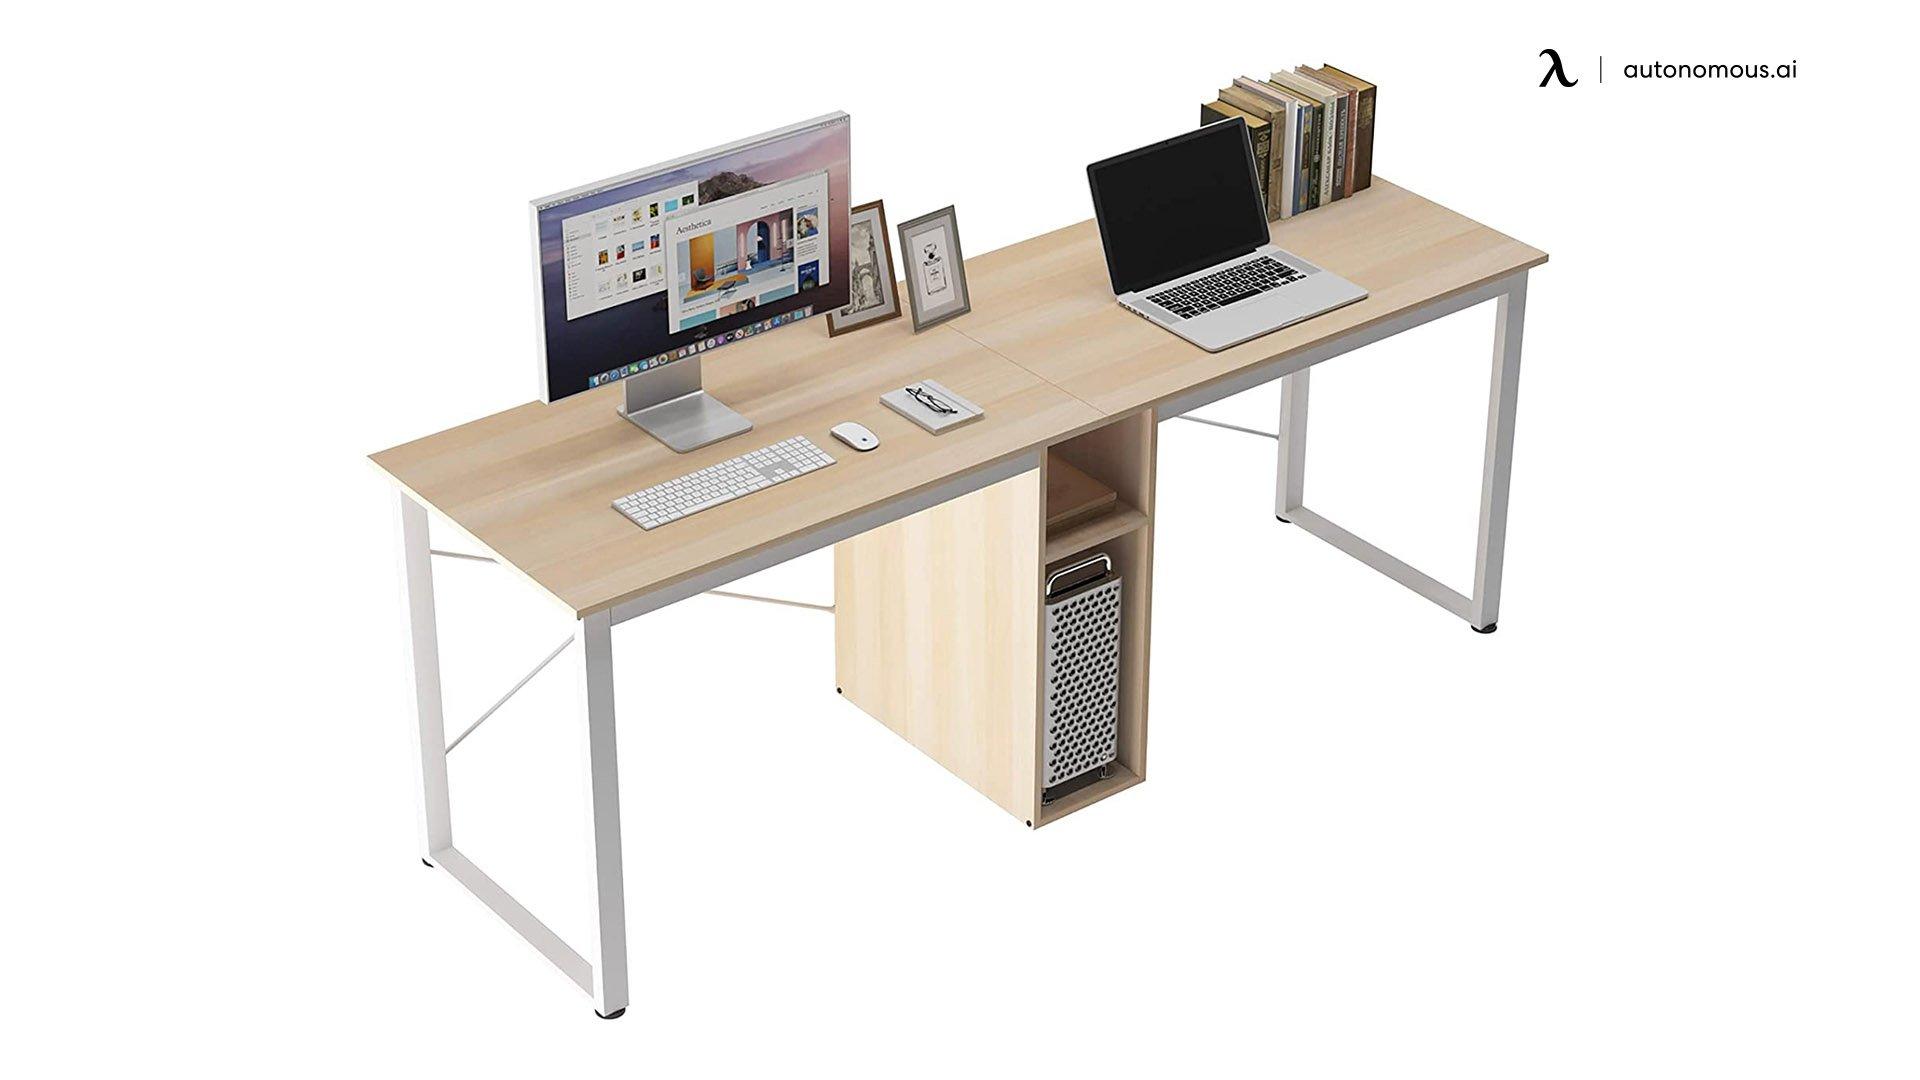 DlandHome Double Computer Storage Desk